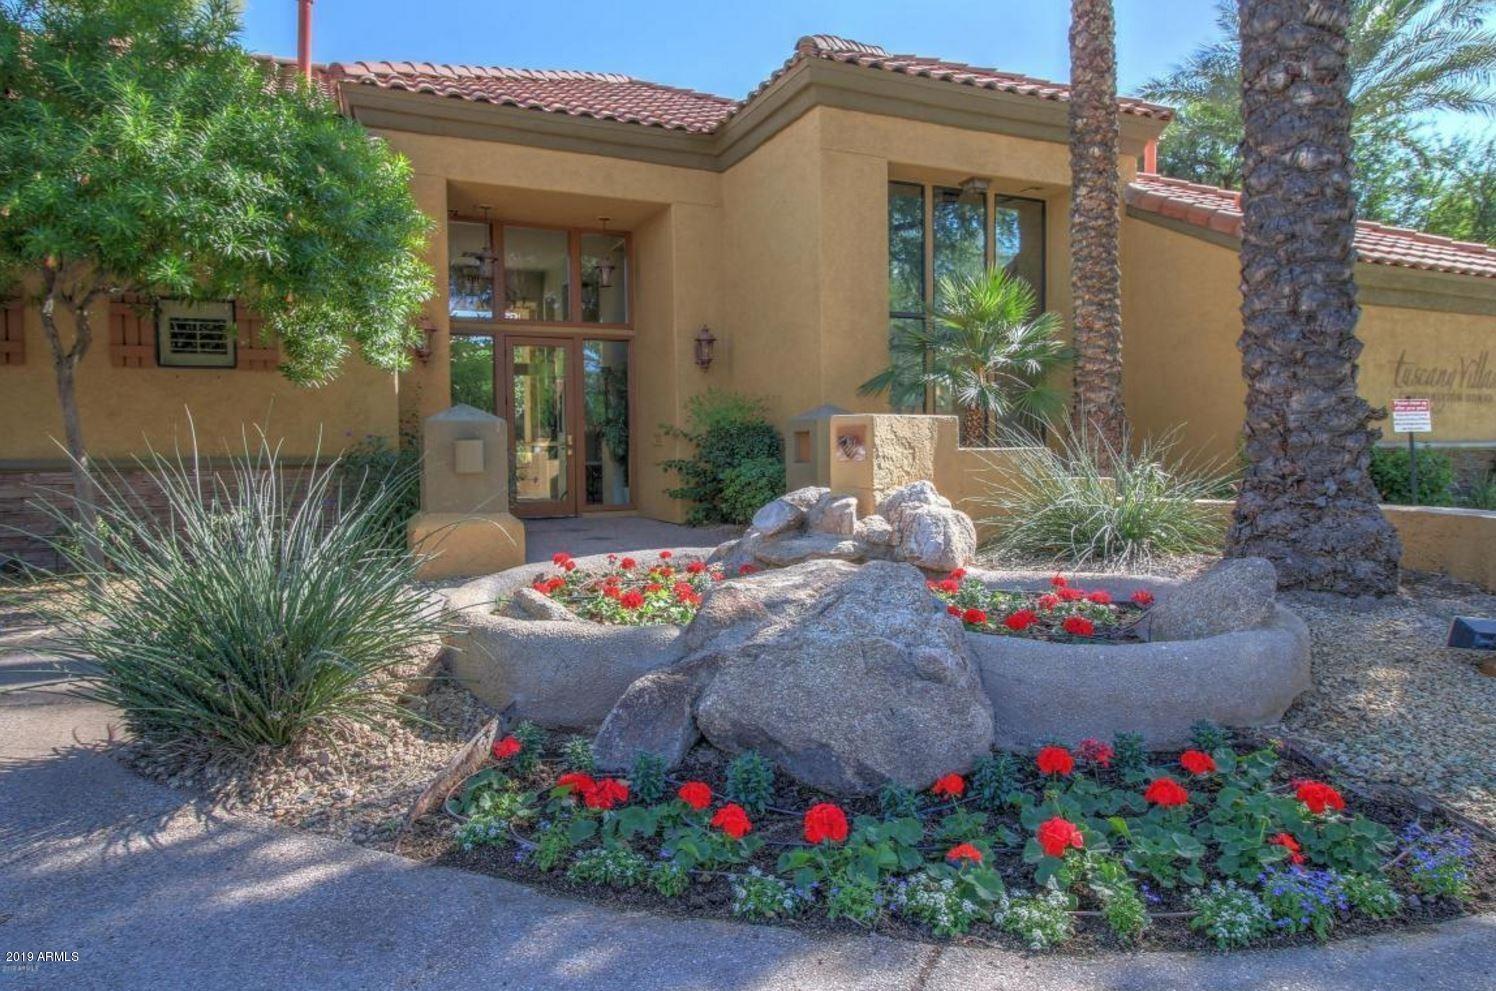 MLS 5914870 4925 E DESERT COVE Avenue Unit 330 Building 9, Scottsdale, AZ 85254 Scottsdale AZ Scottsdale Airpark Area